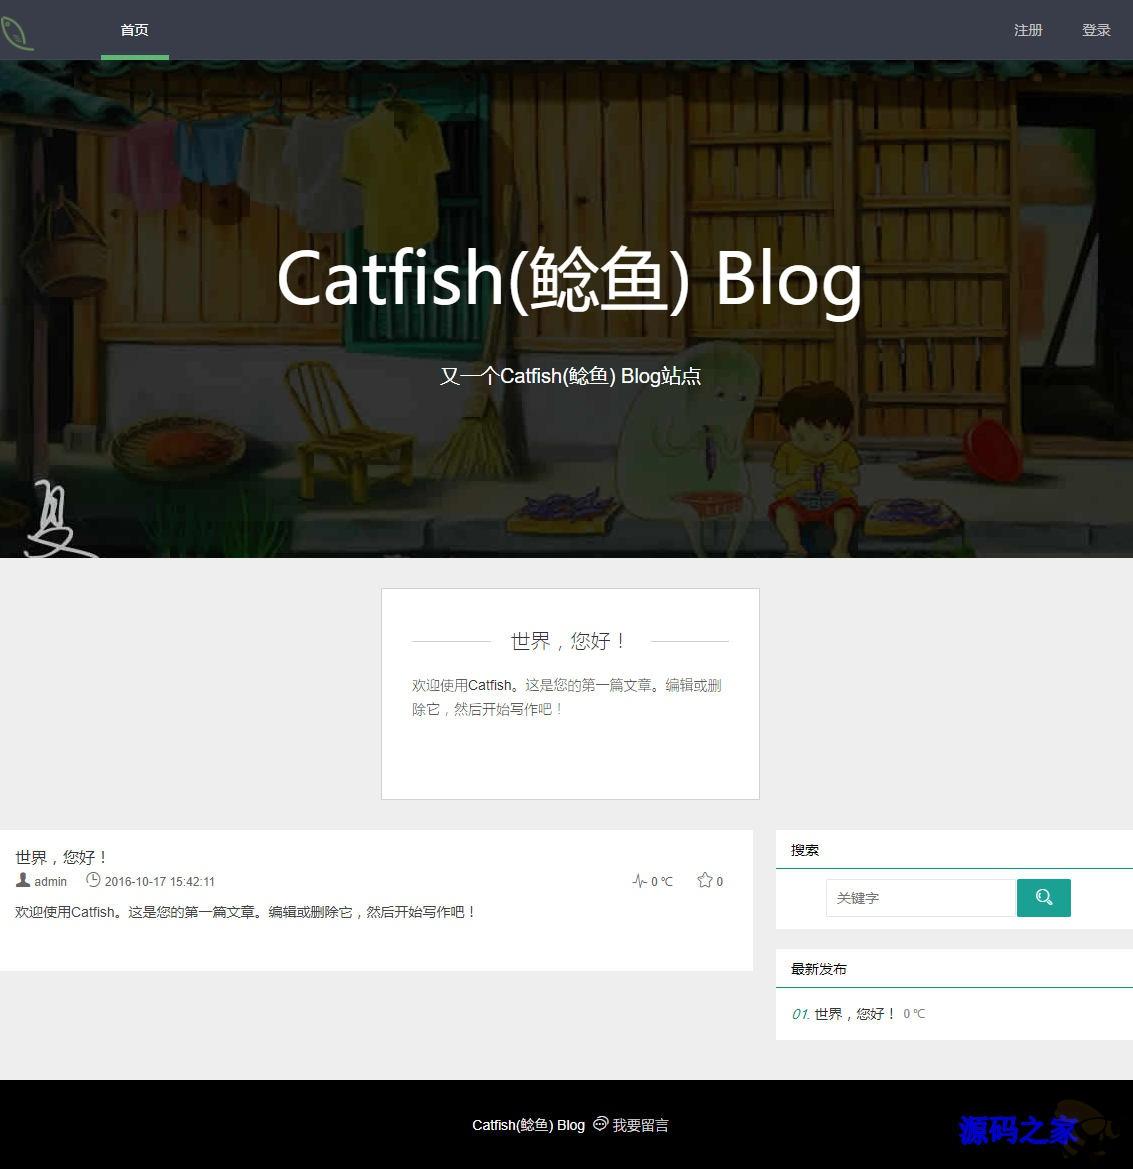 Catfish(鲶鱼) Blog系统 2.0.48